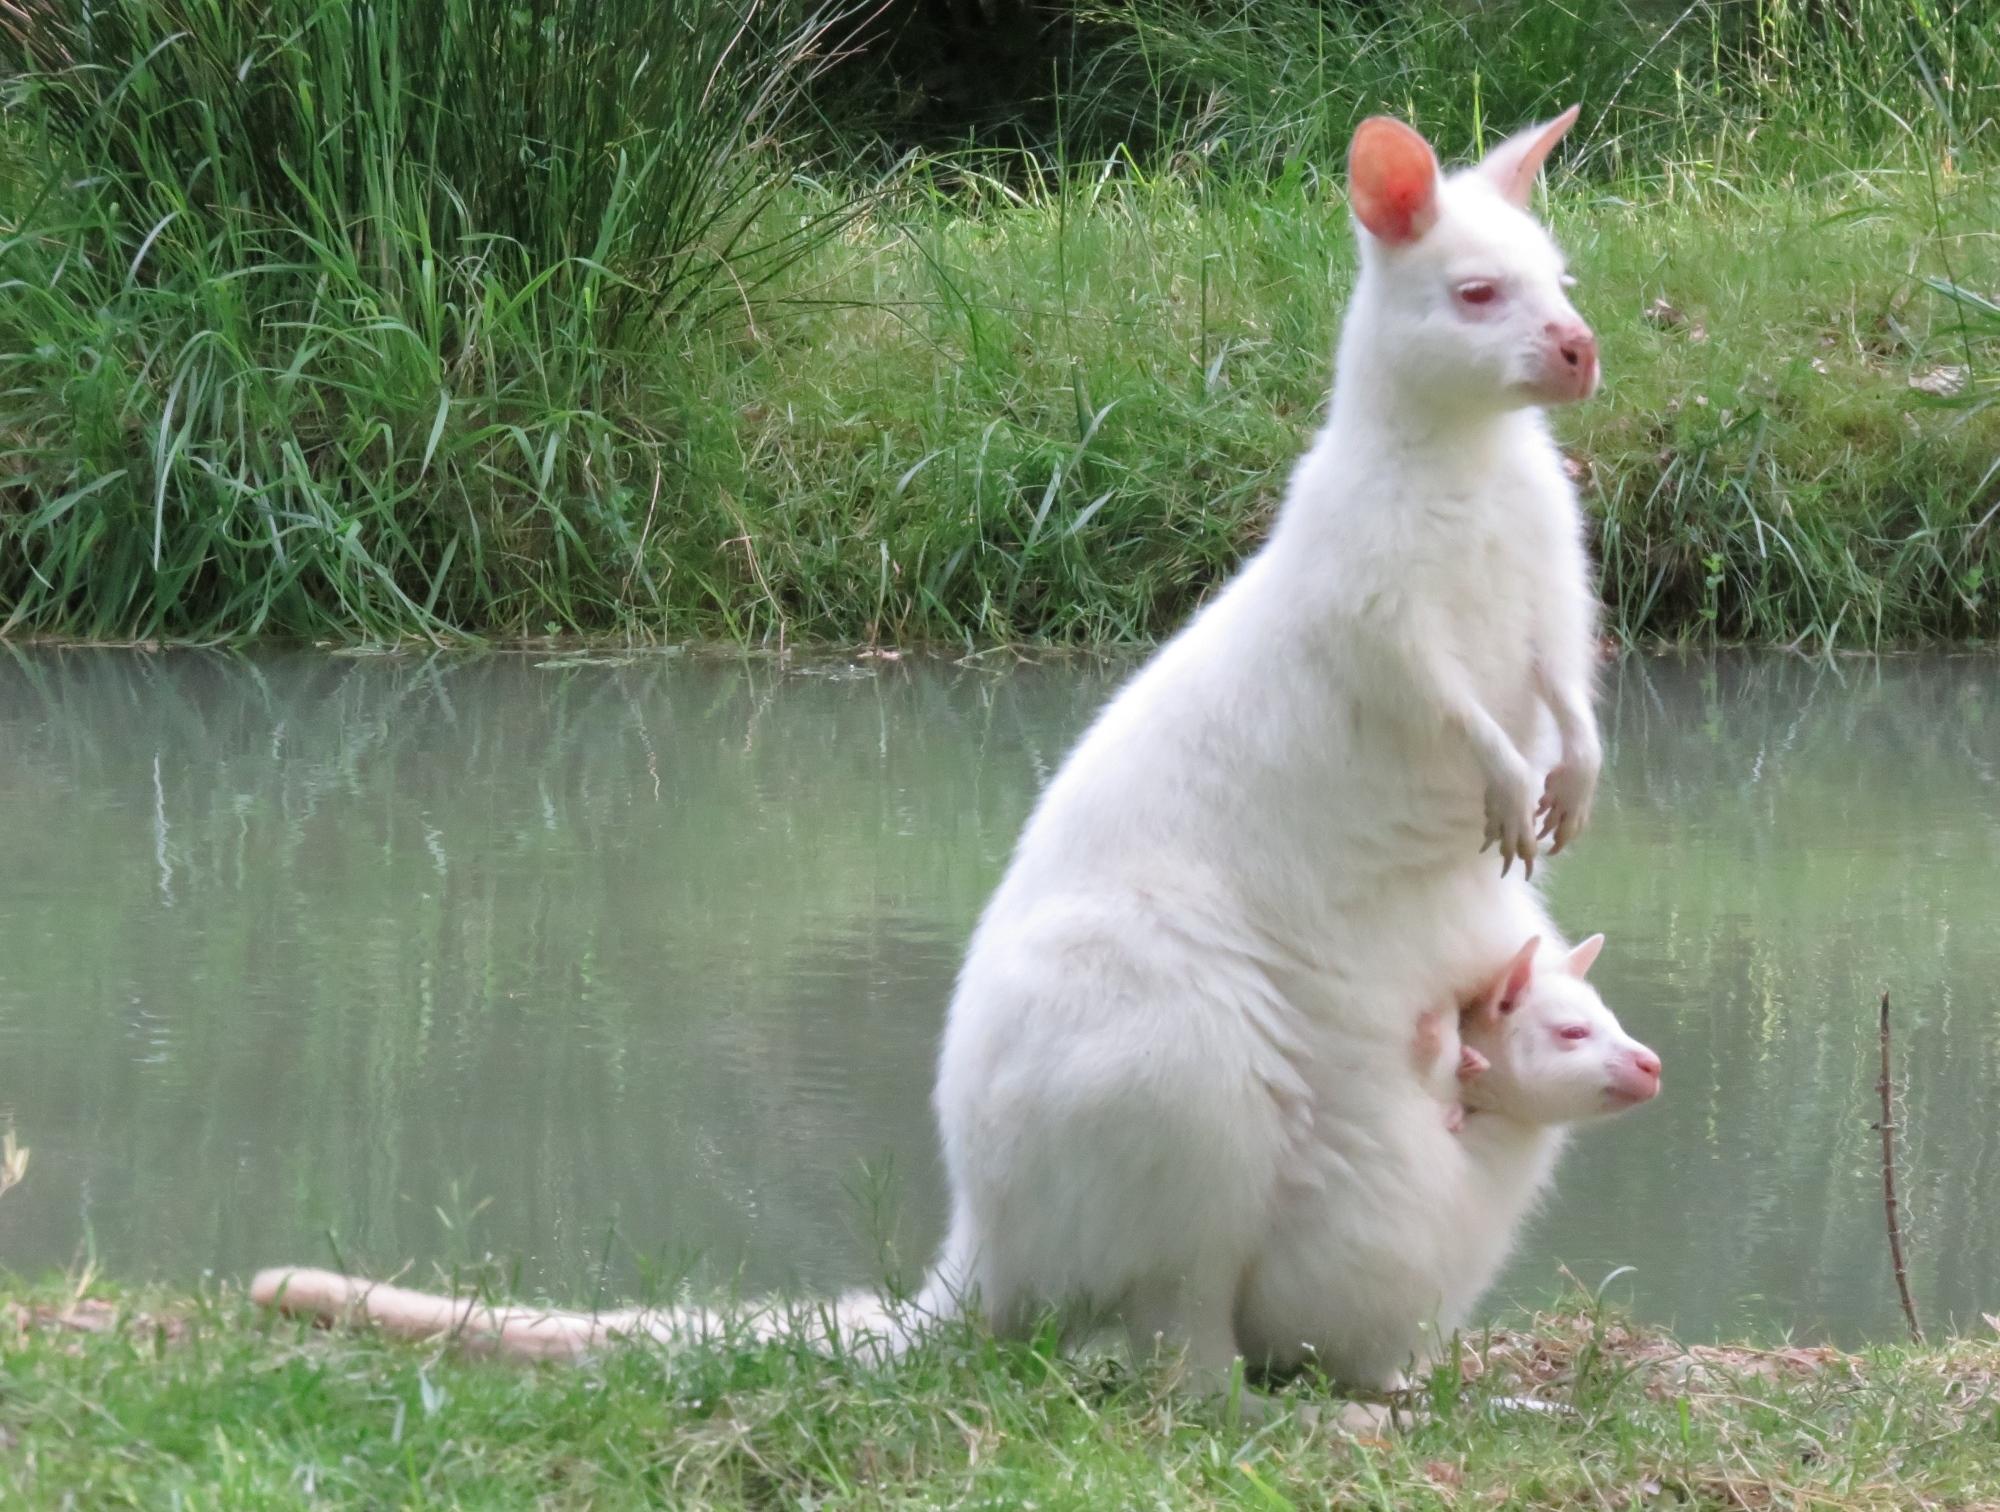 maman wallaby blanc et petit